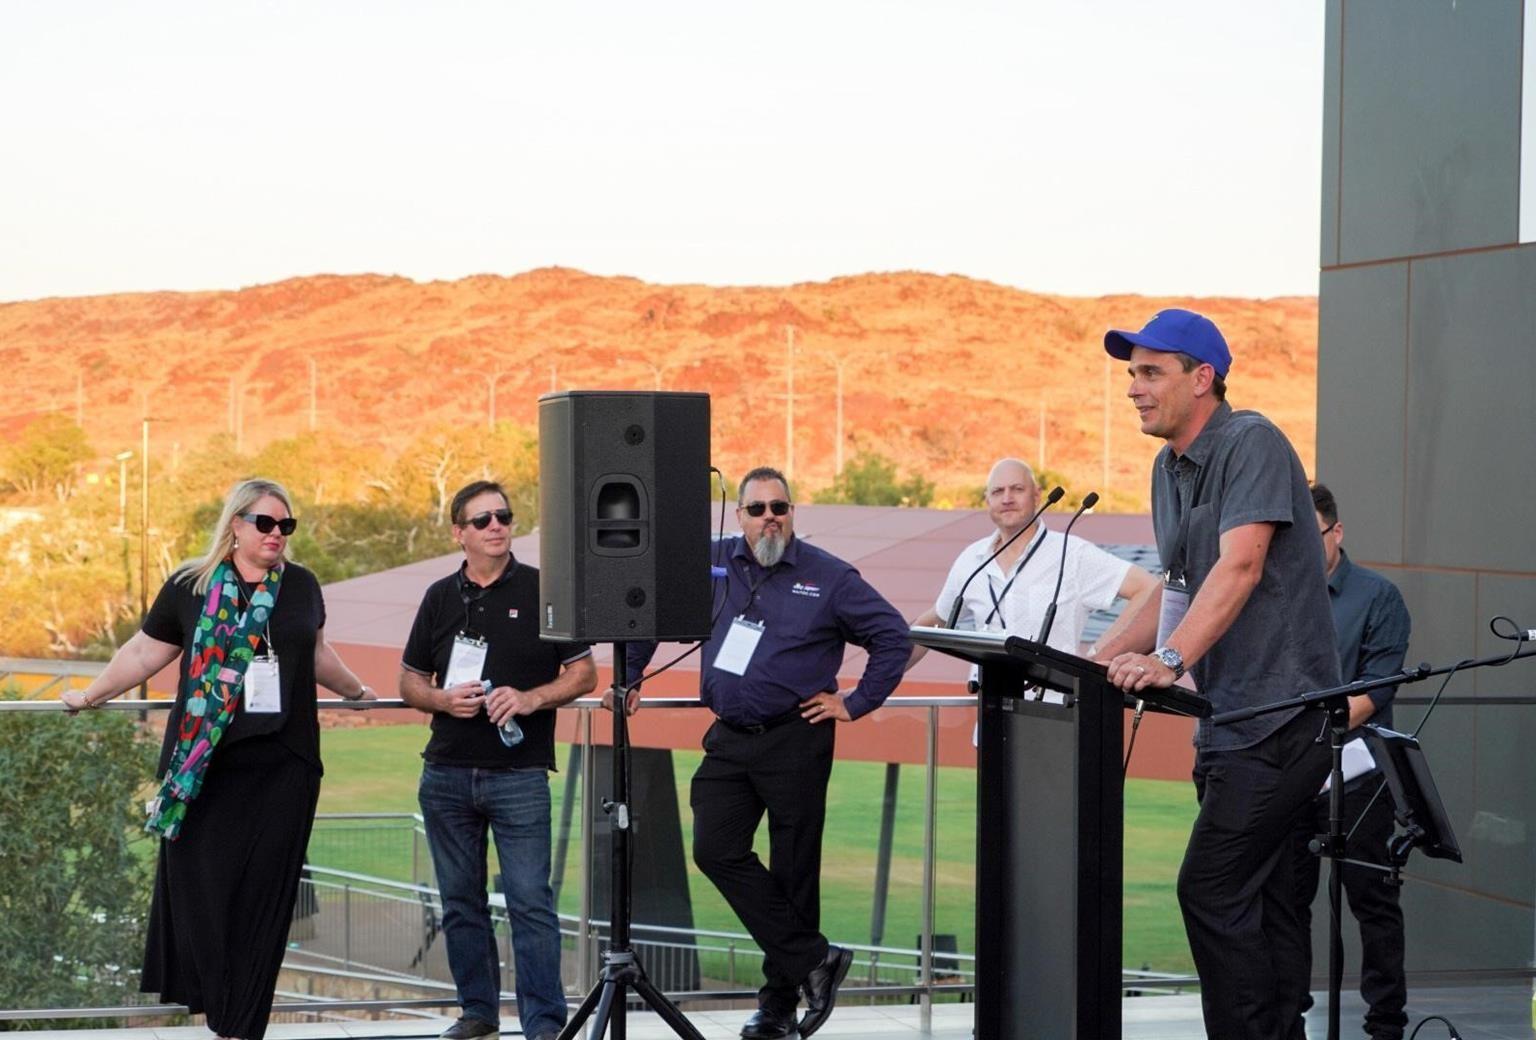 MRBTA Represents at the WA Regional Tourism Conference